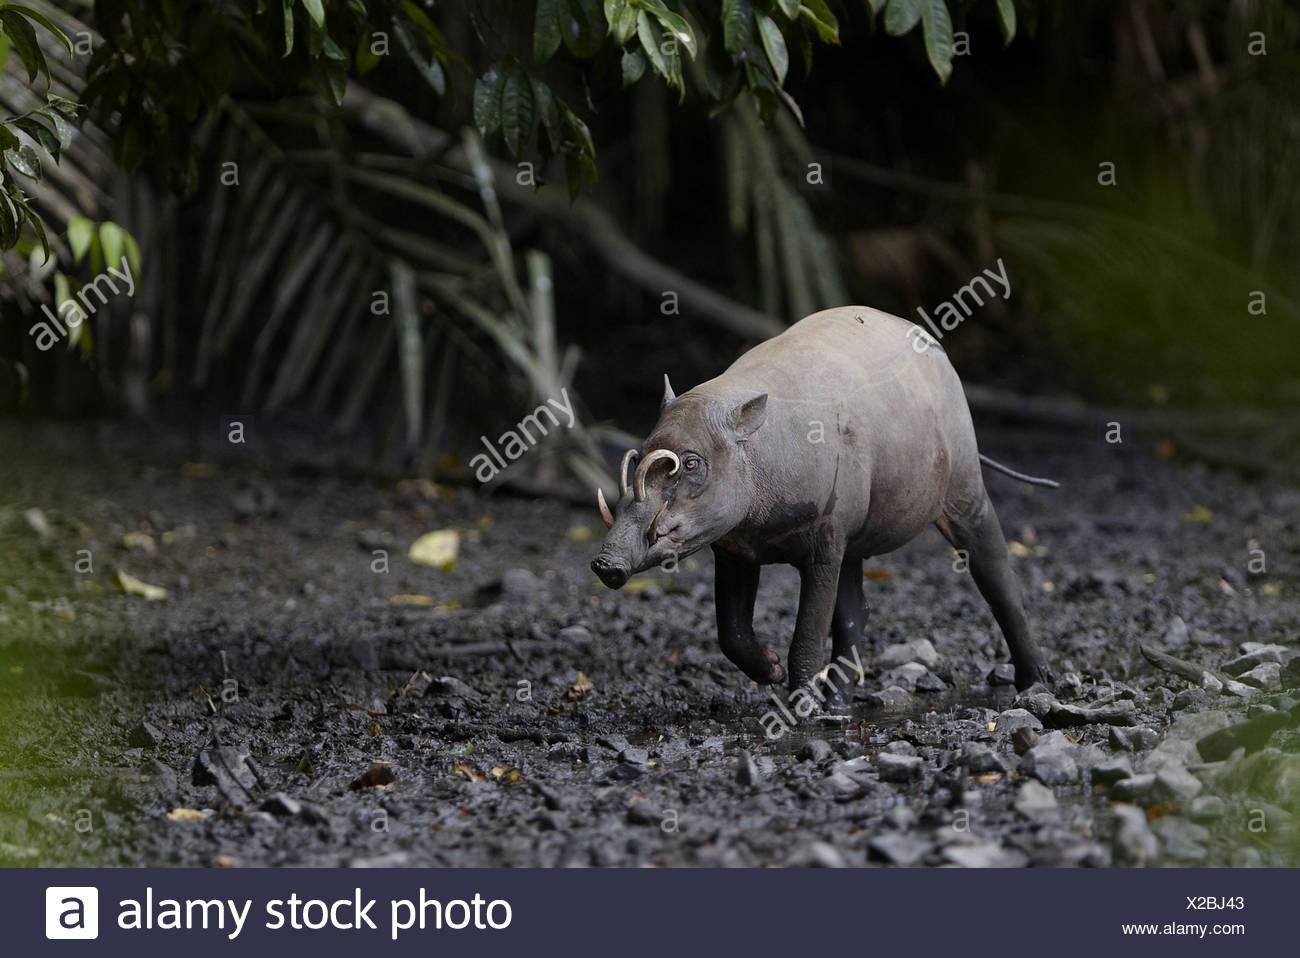 North Sulawesi Babirusa (Babyrousa celebensis) adult male, walking in mud at salt lick, Nantu Reserve, Sulawesi, Indonesia - Stock Image